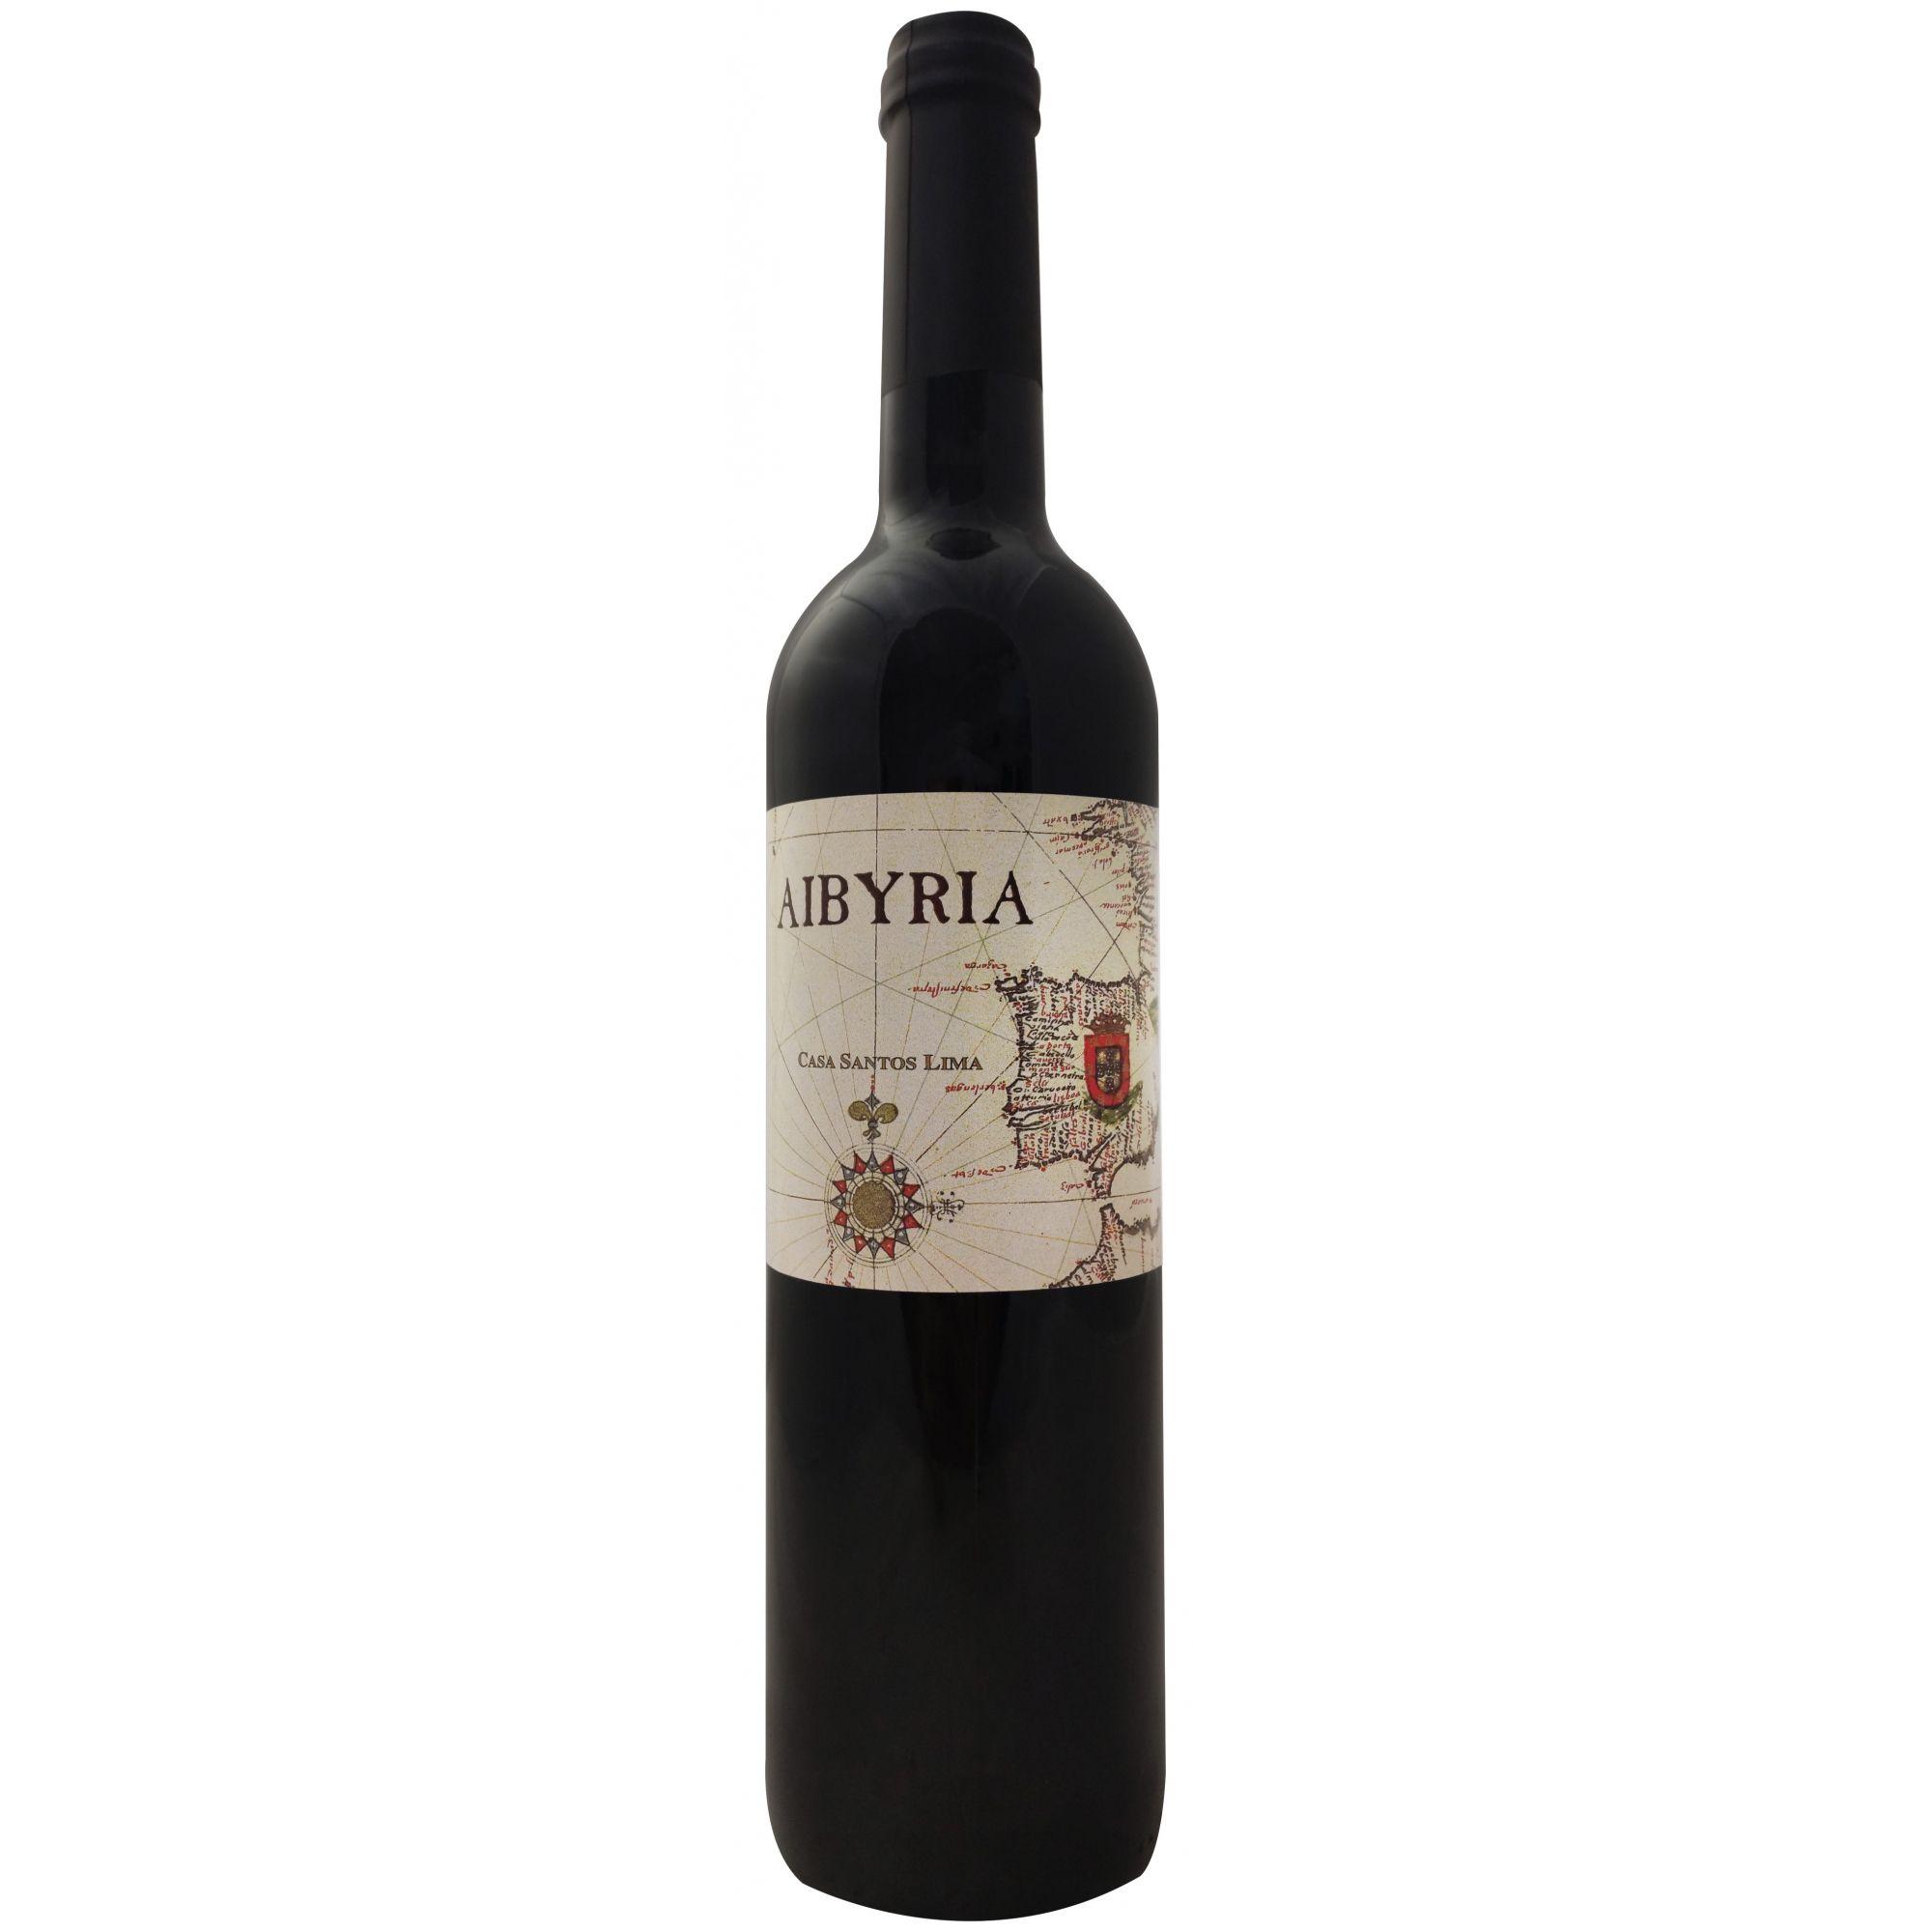 Vinho Tinto Aibyria Regional Lisboa 2016